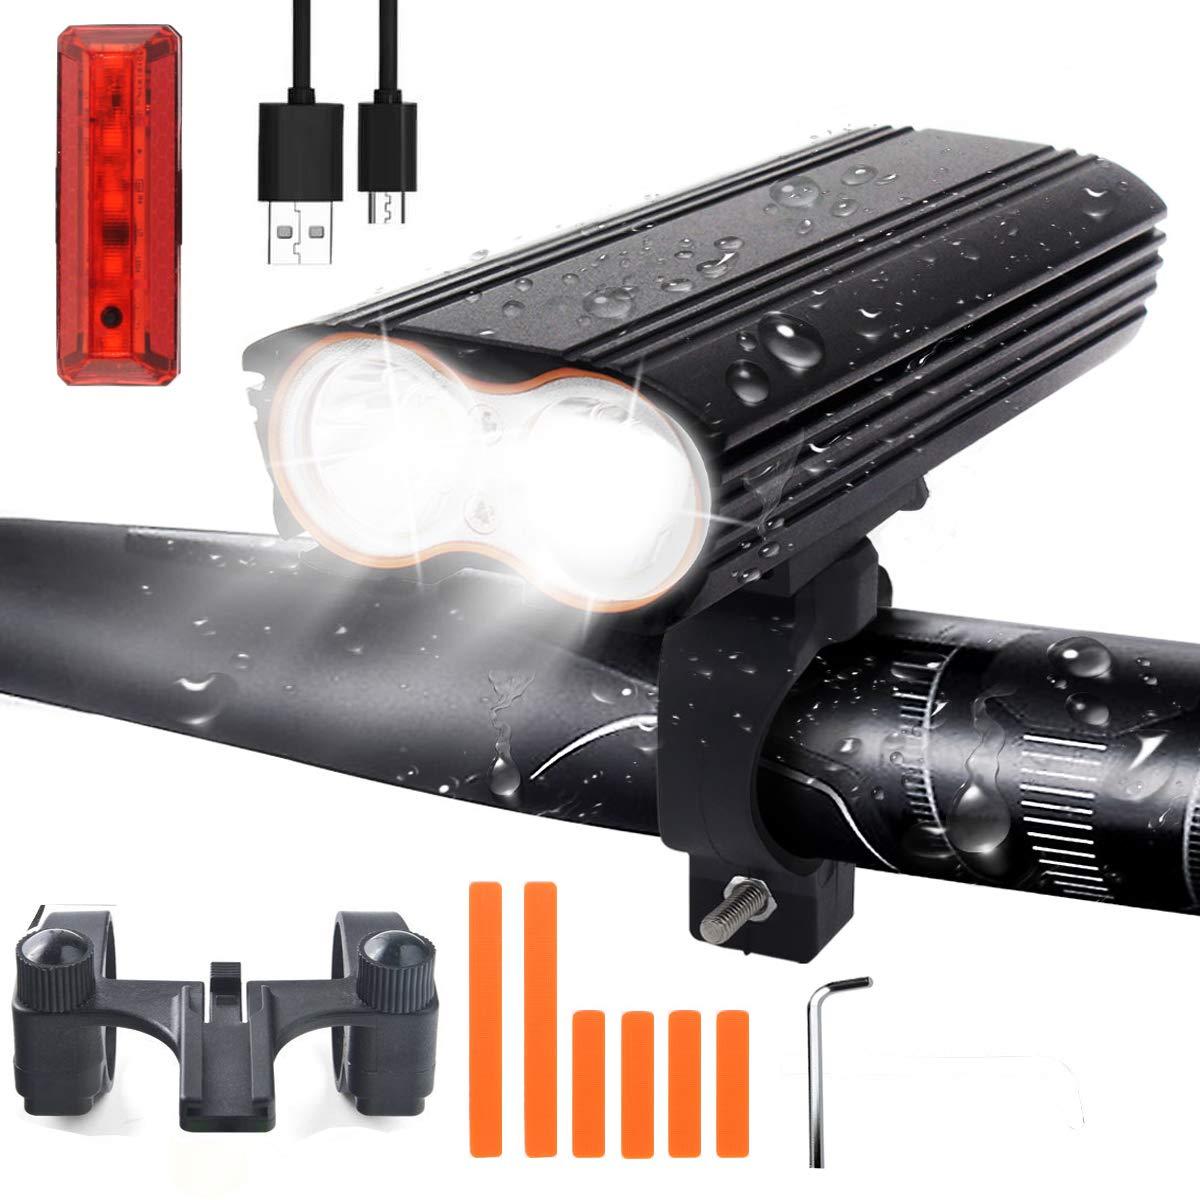 LED Bike Light Set, USB Rechargeable Bike Light Set with 4 Light Modes, 1200 Lumen Dual LED Light Beads Mountain Bike Light, IP65 Waterproof Bicycle Light Set for Night Rider, Cycling and Camping VISLAN